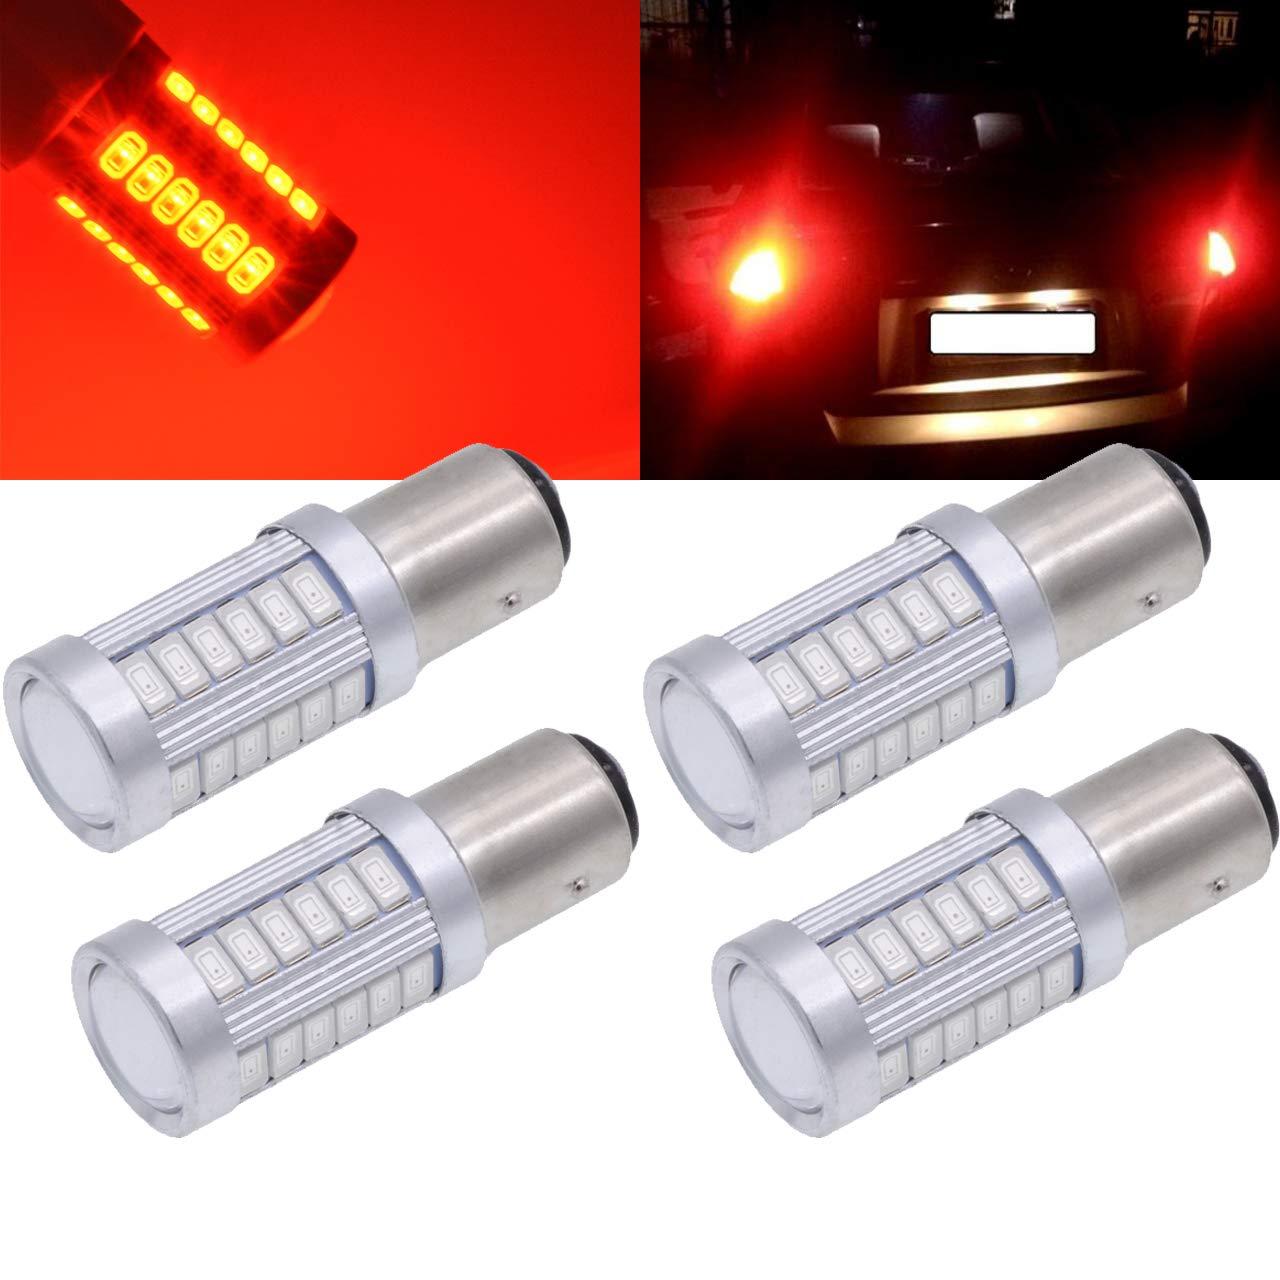 TUINCYN BAU15S PY21W LED Bulb White Brake Light Bulb Super Bright 8000K 5630 33SMD 1156 7507 12496 5009 7507AST Turn Signals Light Back Up Reverse Light Parking Light DC 12V (Pack of 2)